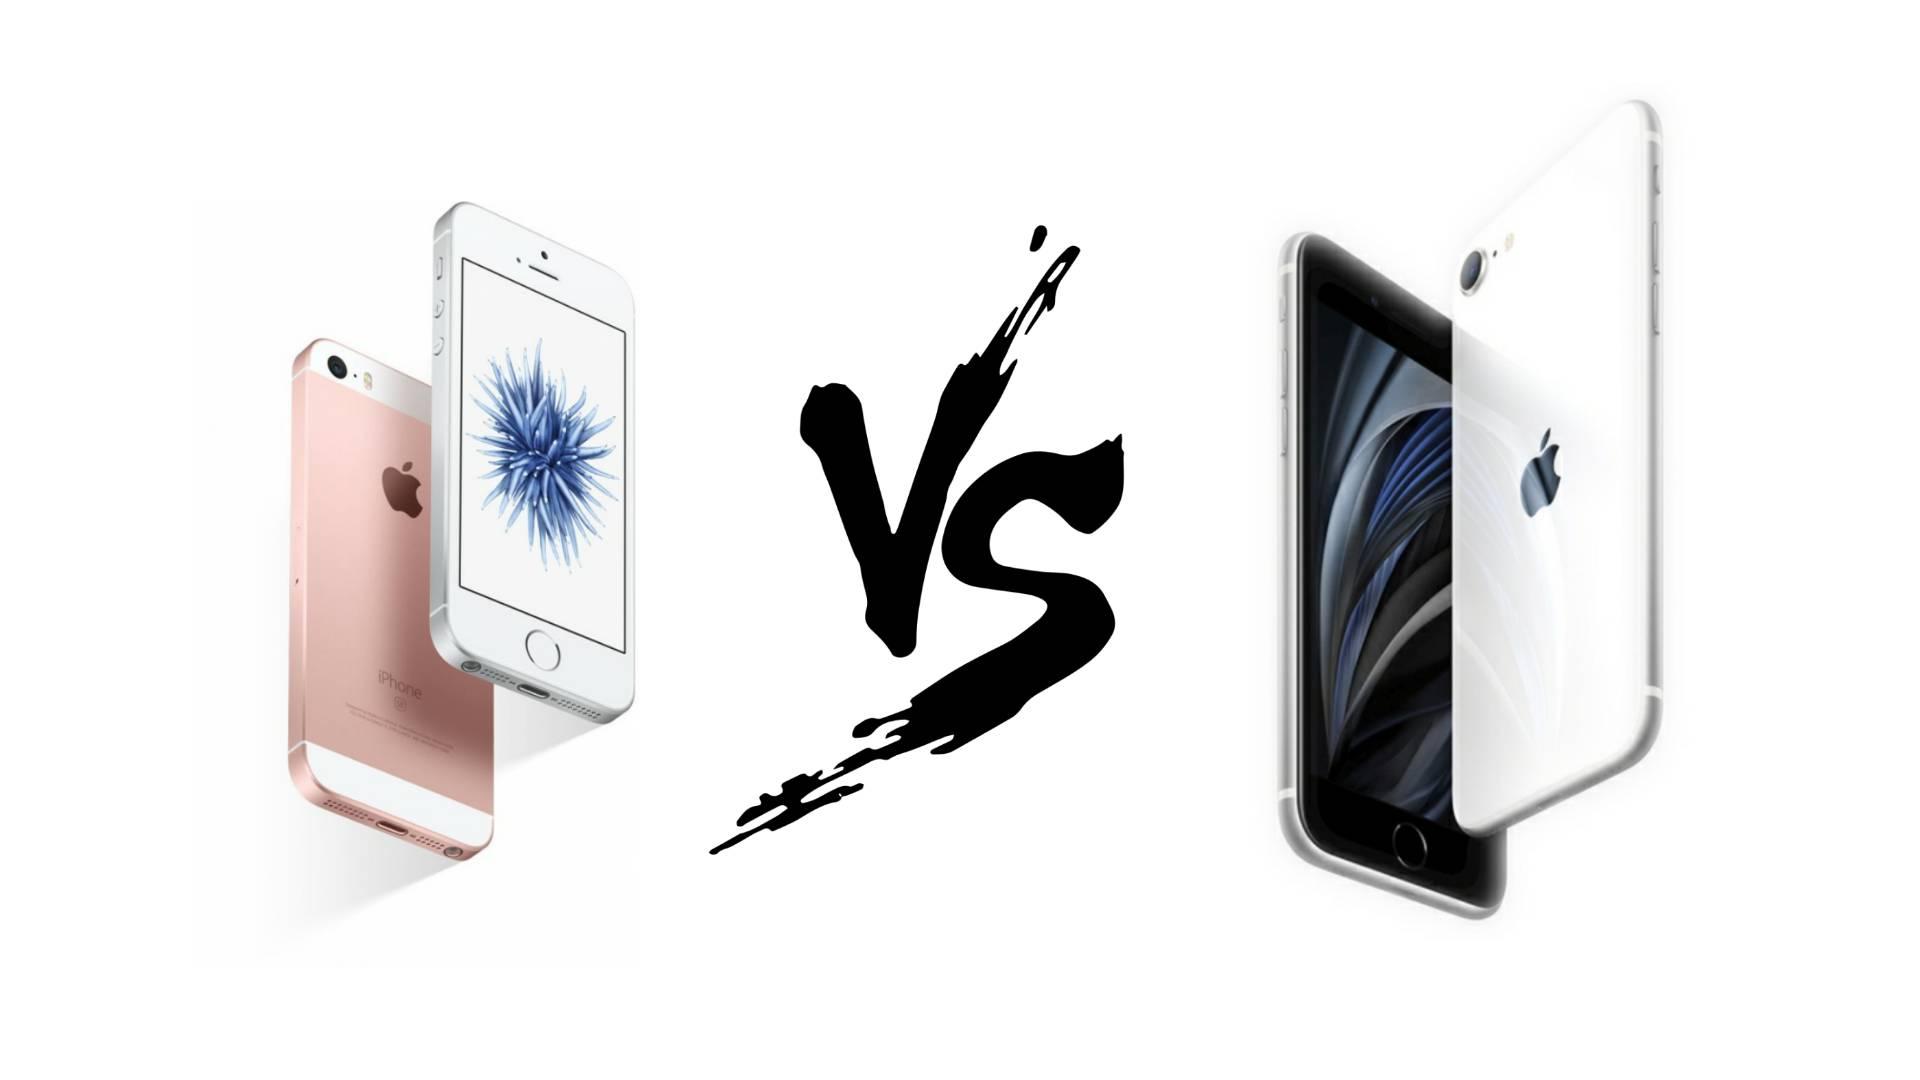 iPhone SE (2020) VS iPhone SE (2016)